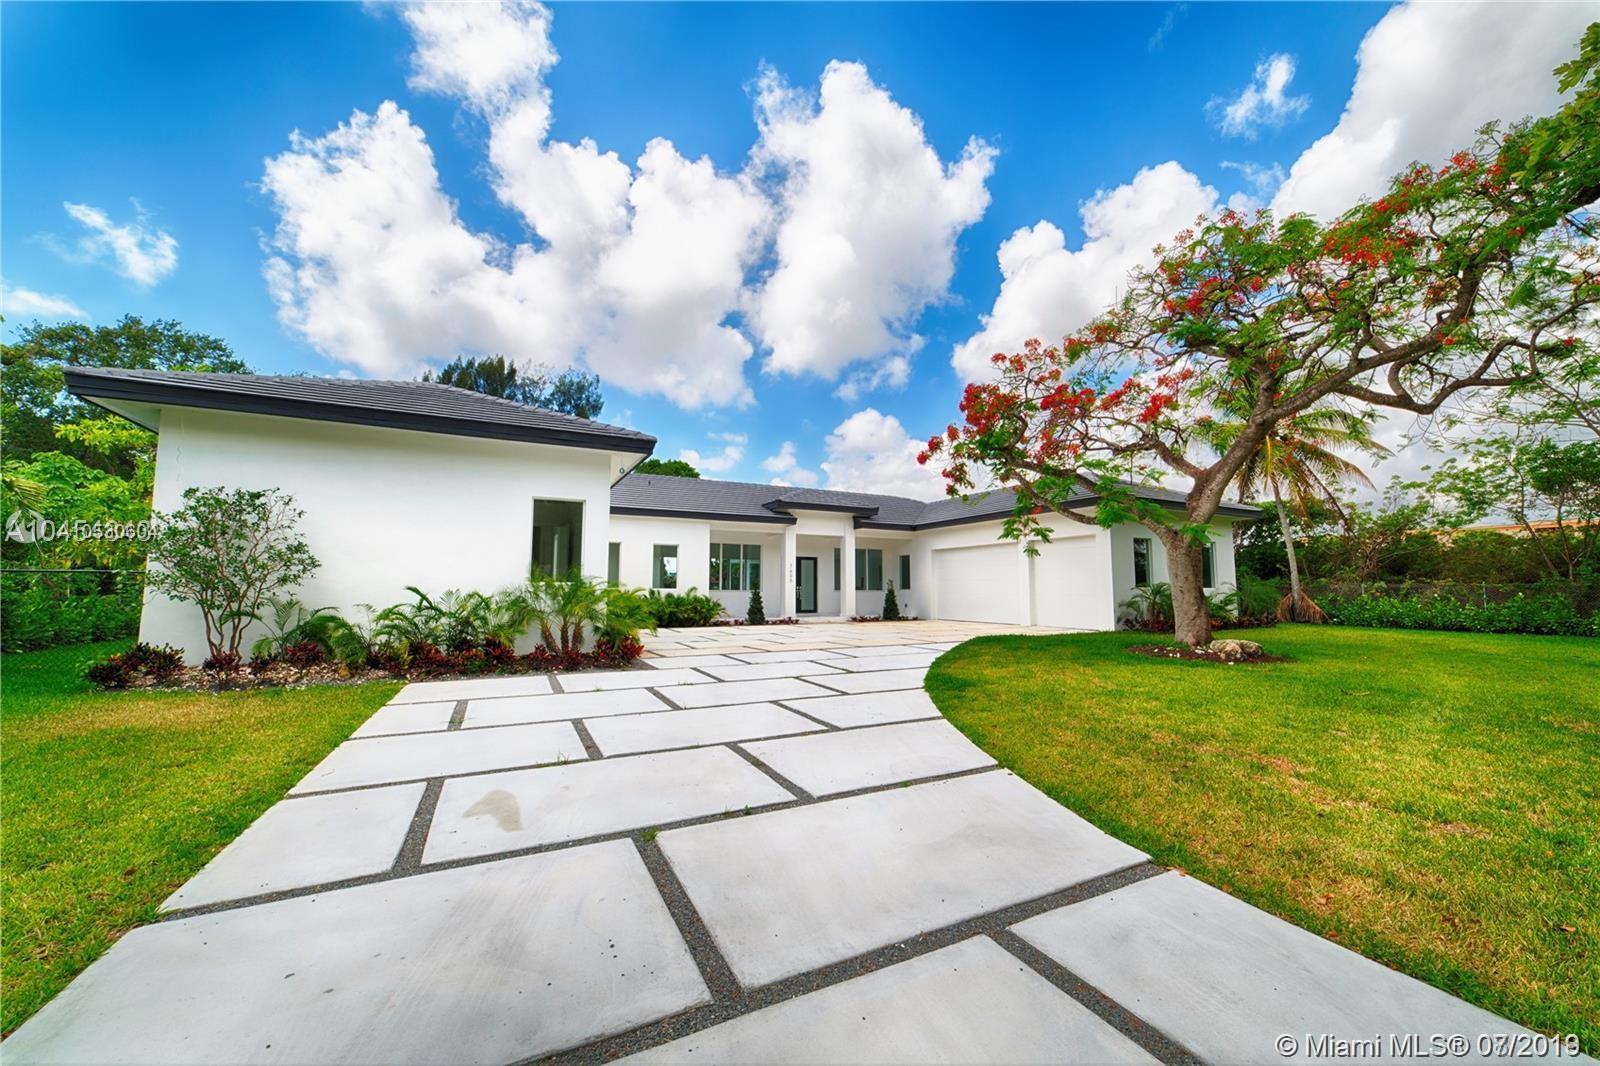 35202 SW 219 AVE, Homestead, Florida